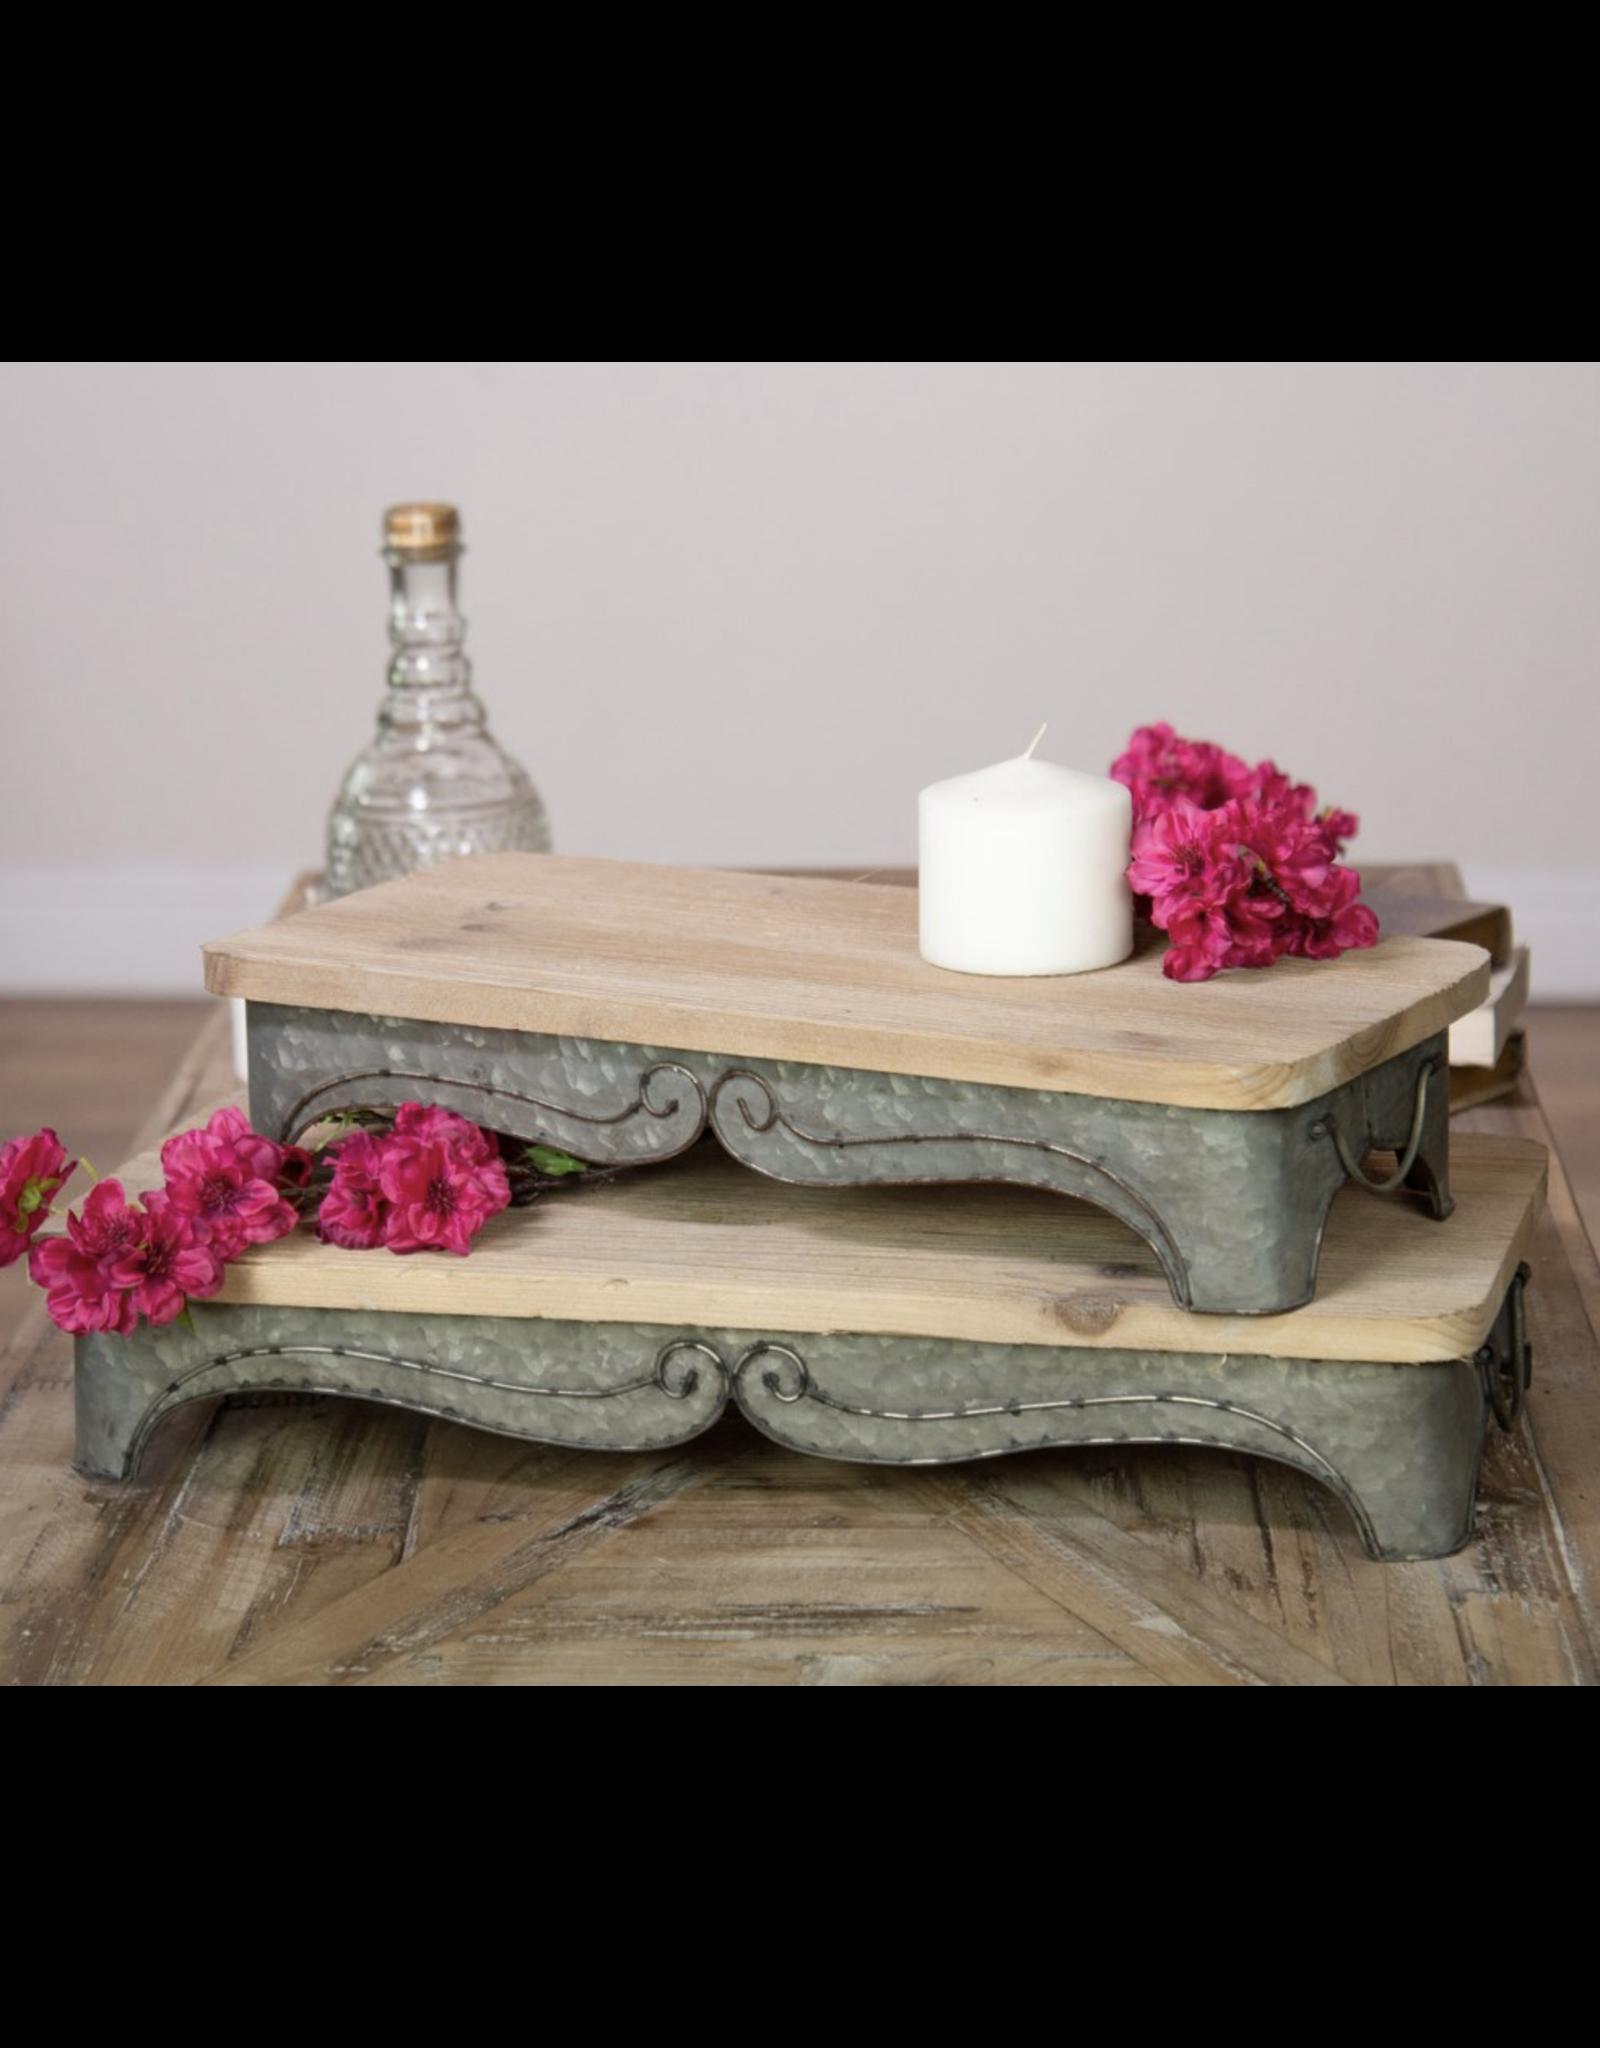 VIP Home & Garden Metal/Wood Riser Small